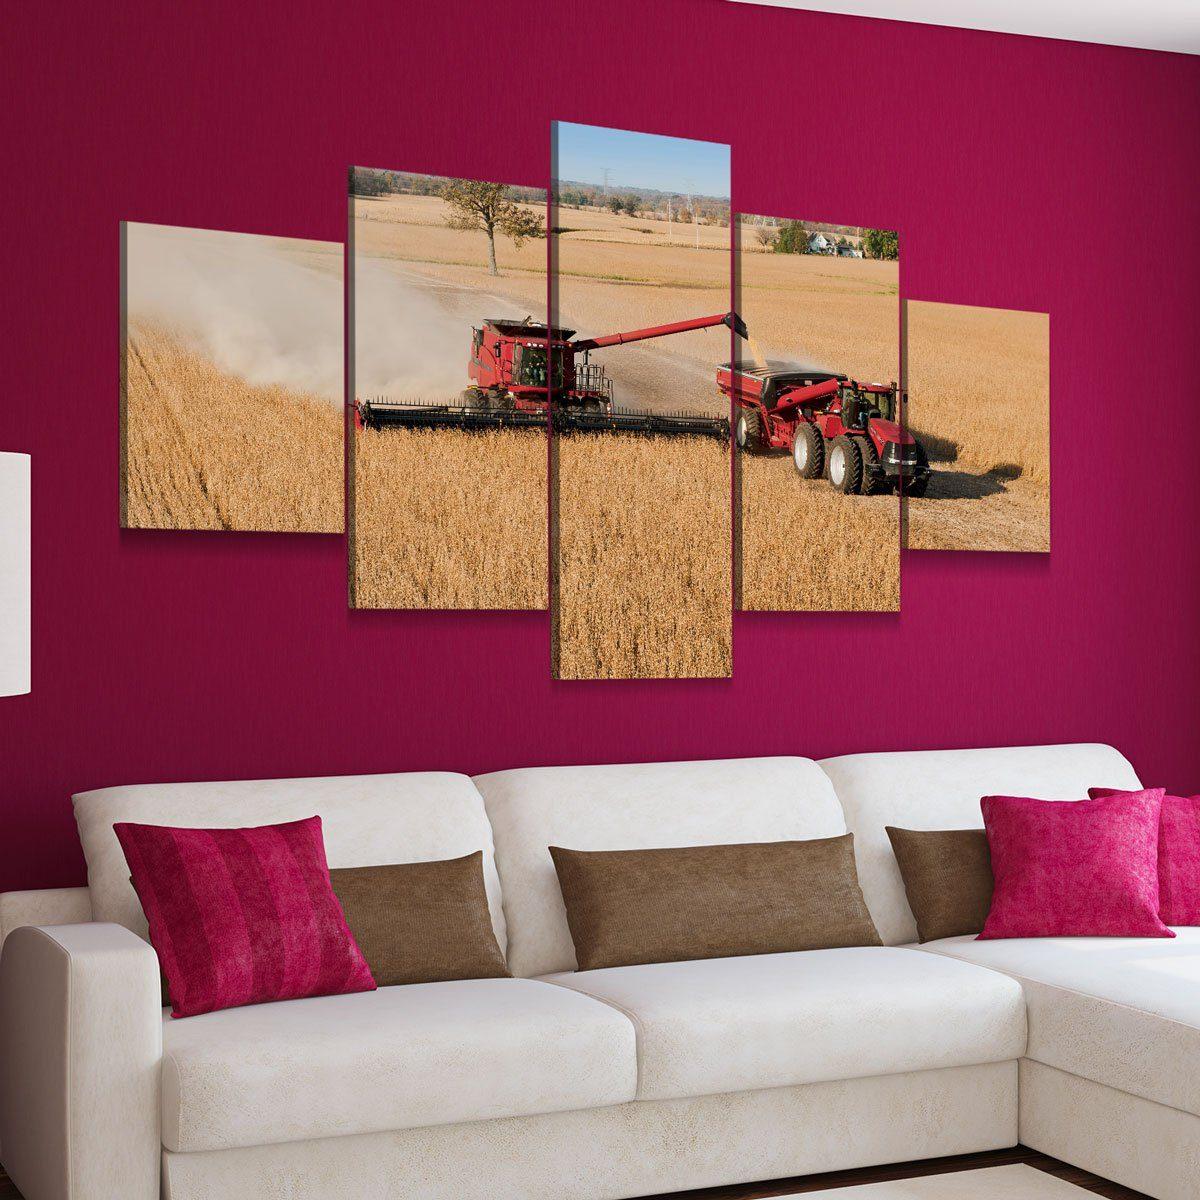 Harvest Time V2 5 panel canvas wall art